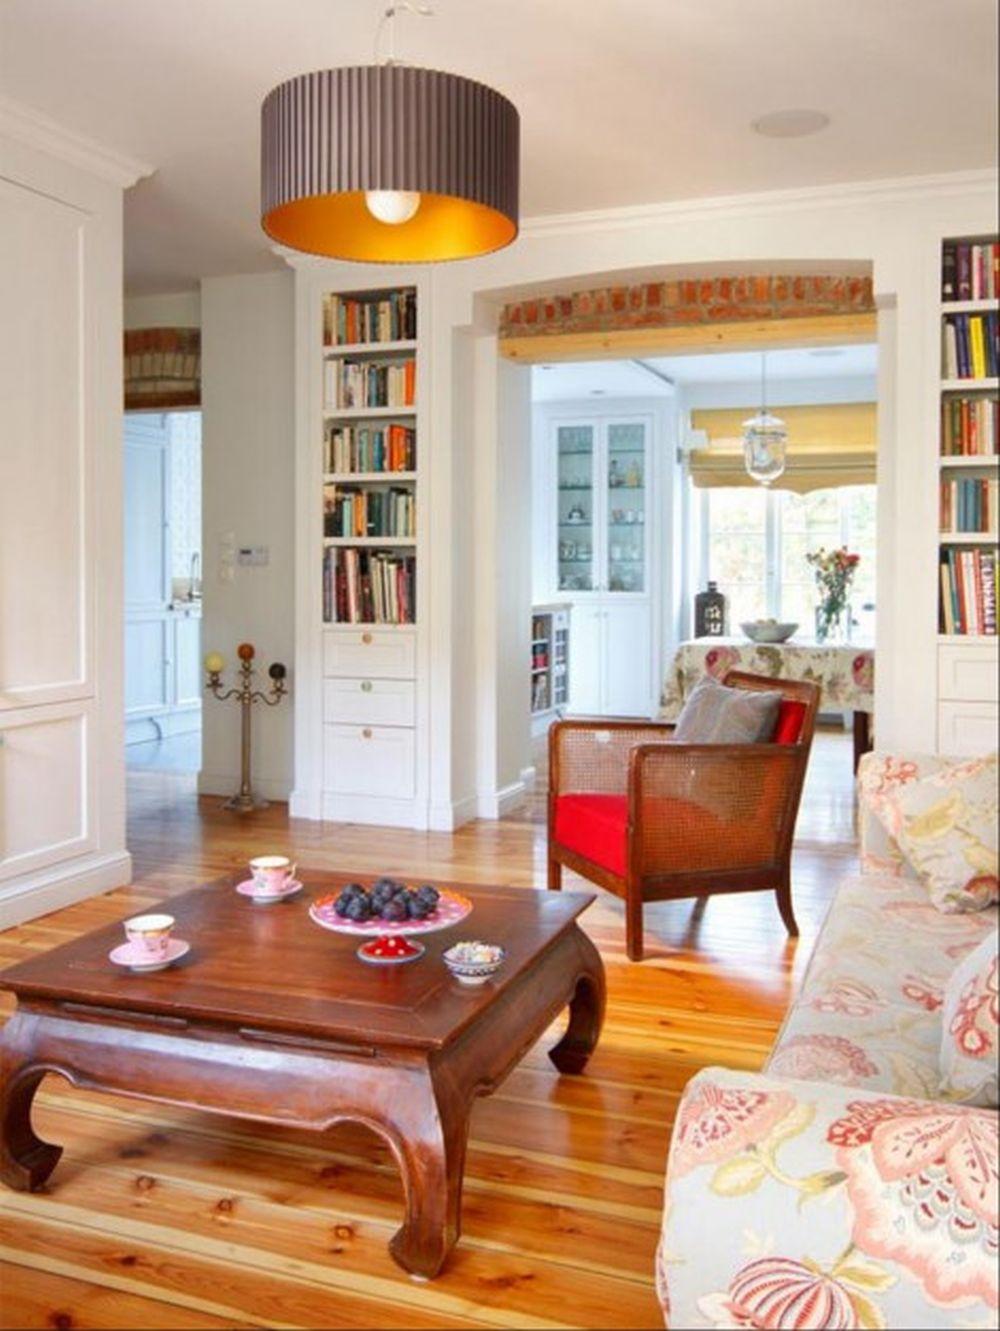 adelaparvu.com despre casa cu interior in stil englezesc, casa Polonia, design Marta Sikorska, Foto Michal Zalewski (2)